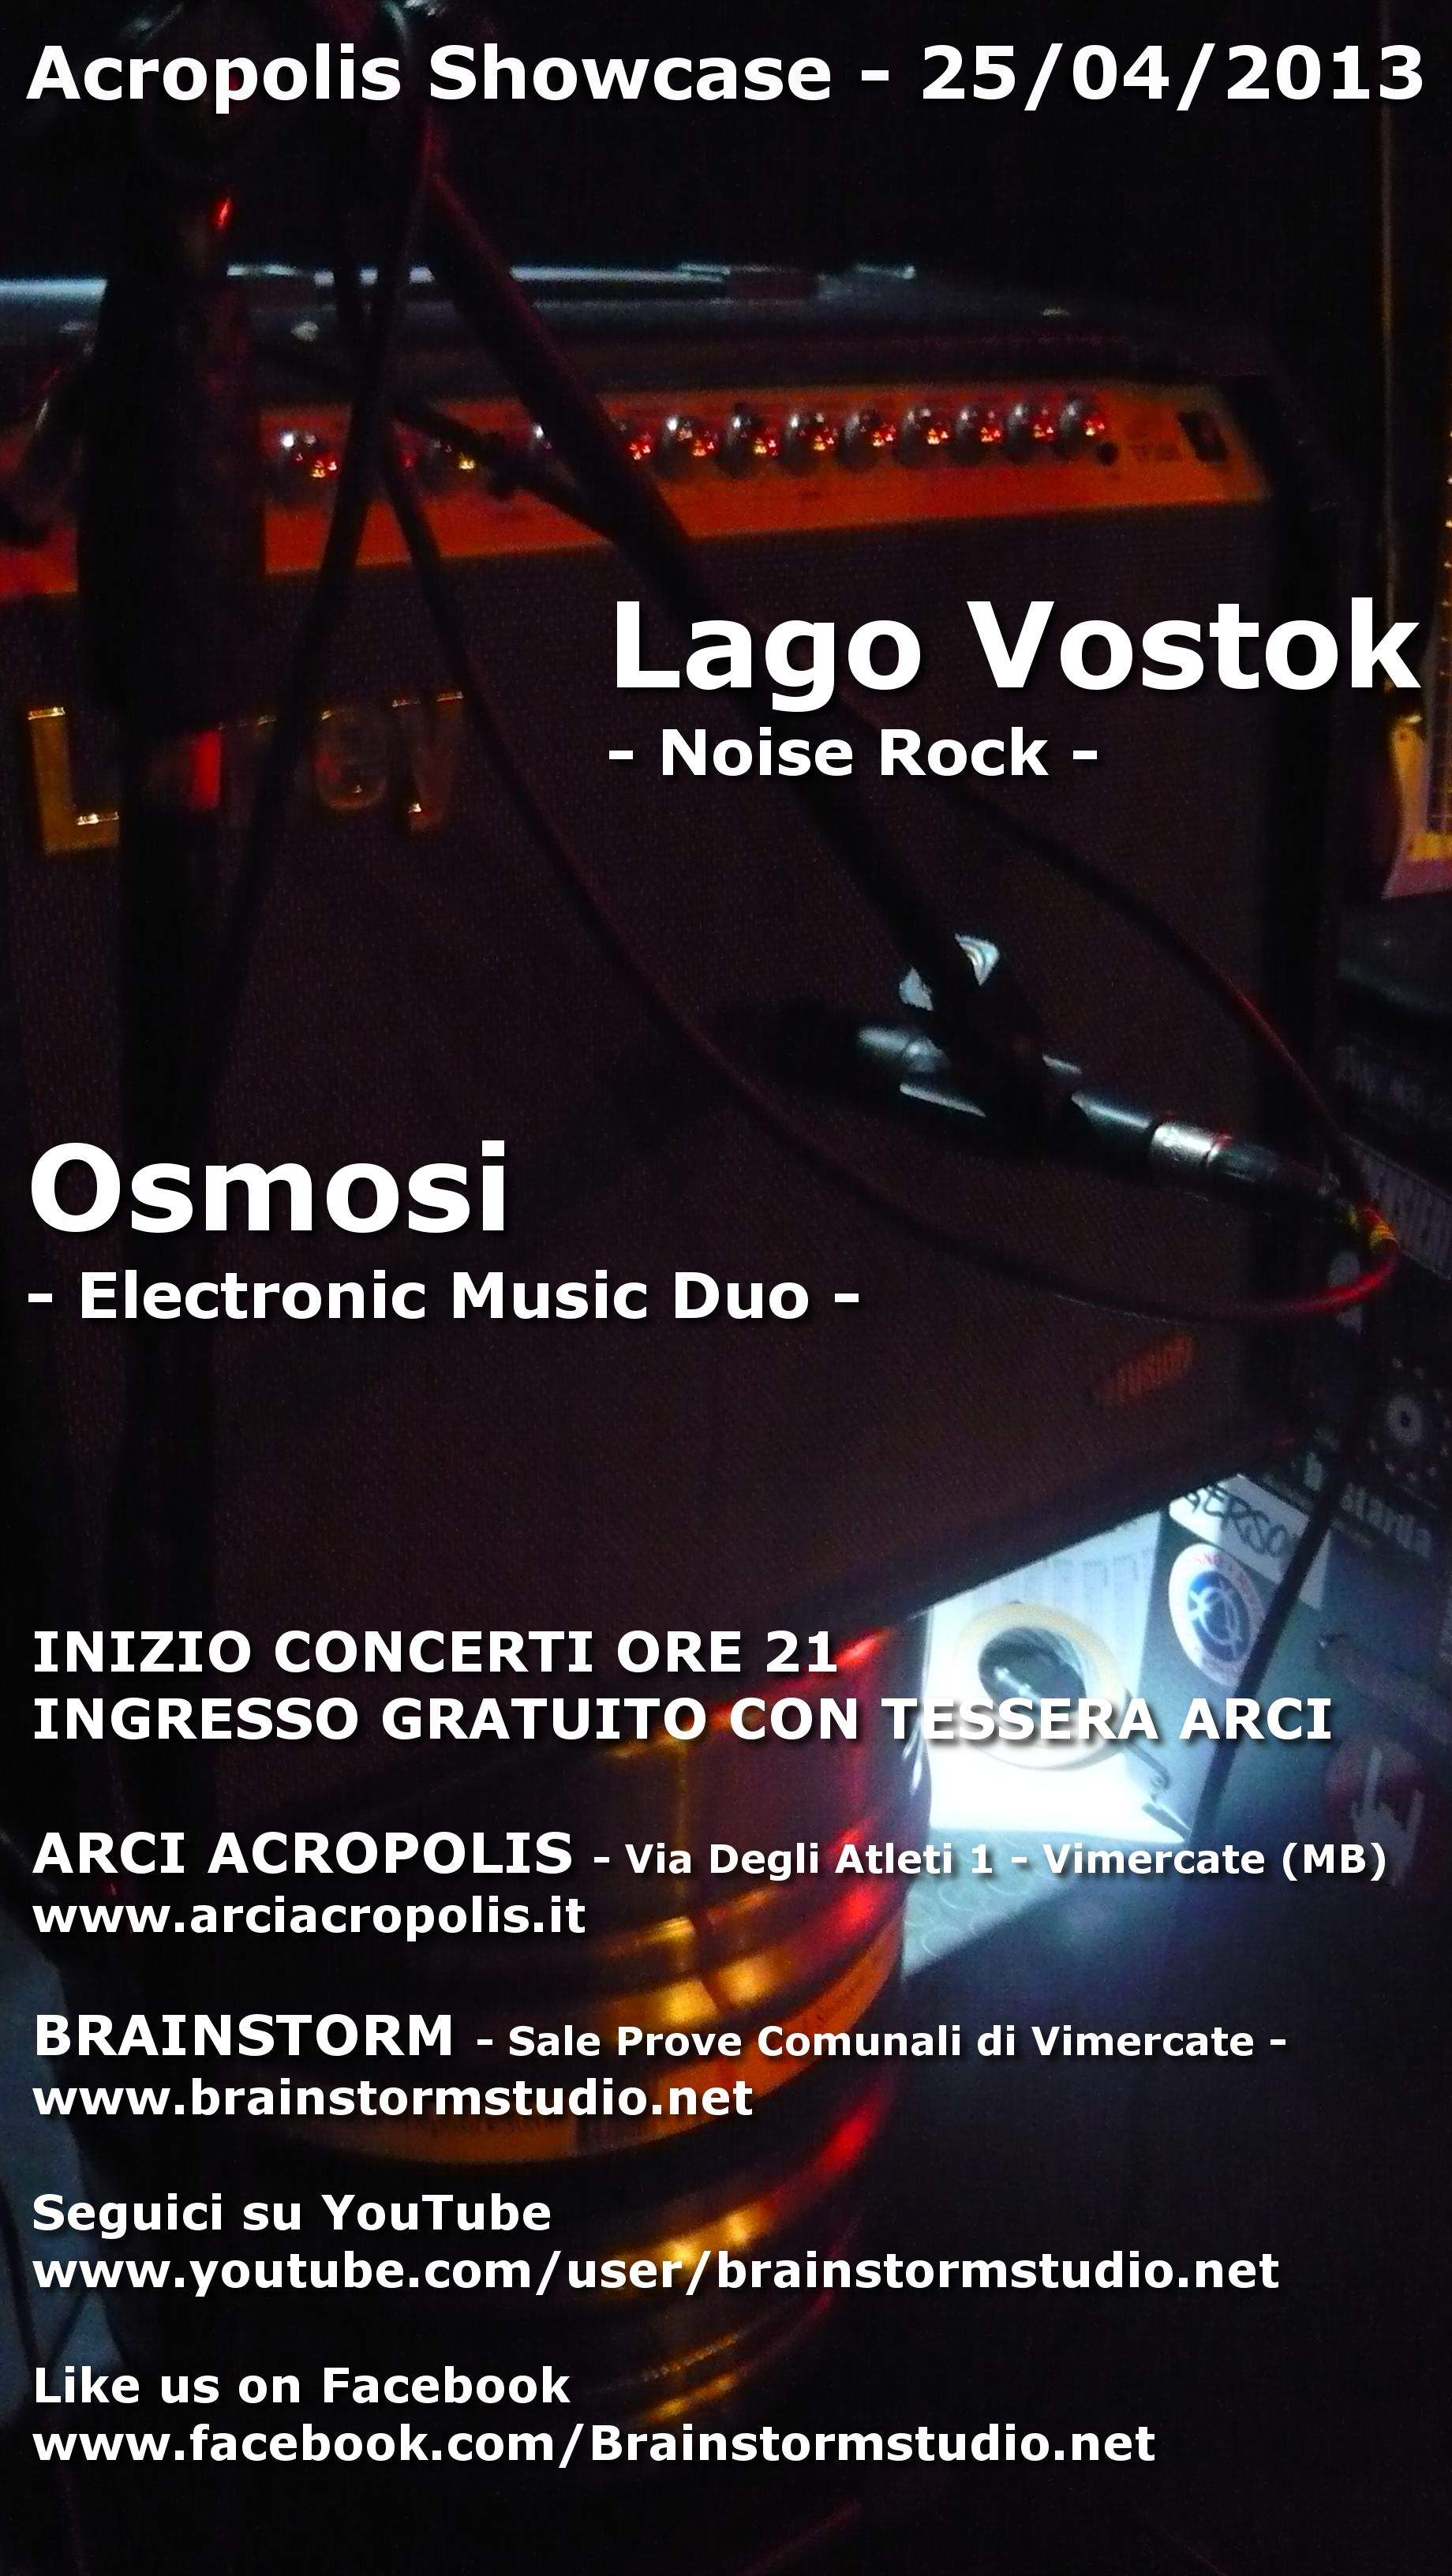 Acropolis Showcase 25/04/2013: Lago Vostok + Osmosi @ Arci Acropolis + Brainstorm Studio - Sale Prove Comunali di Vimercate